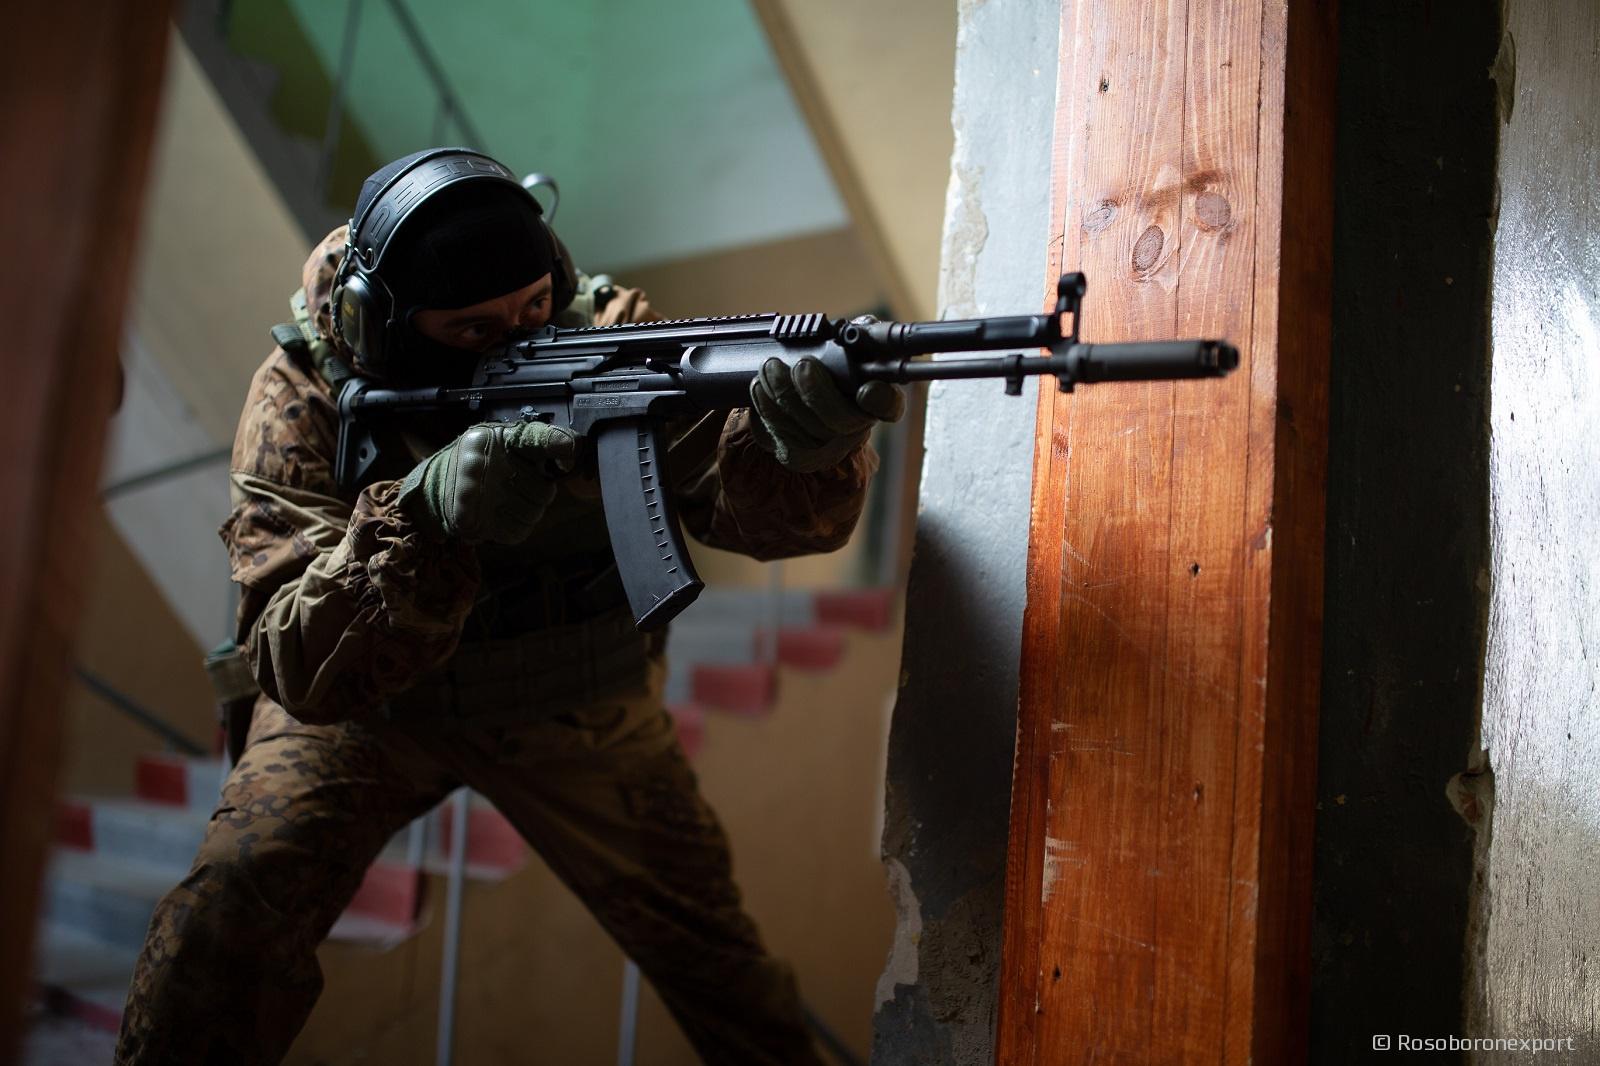 Russian Assault Rifles/Carbines/Machine Guns Thread: #2 - Page 10 5a6cda6601885824b52fa5cfe330df95